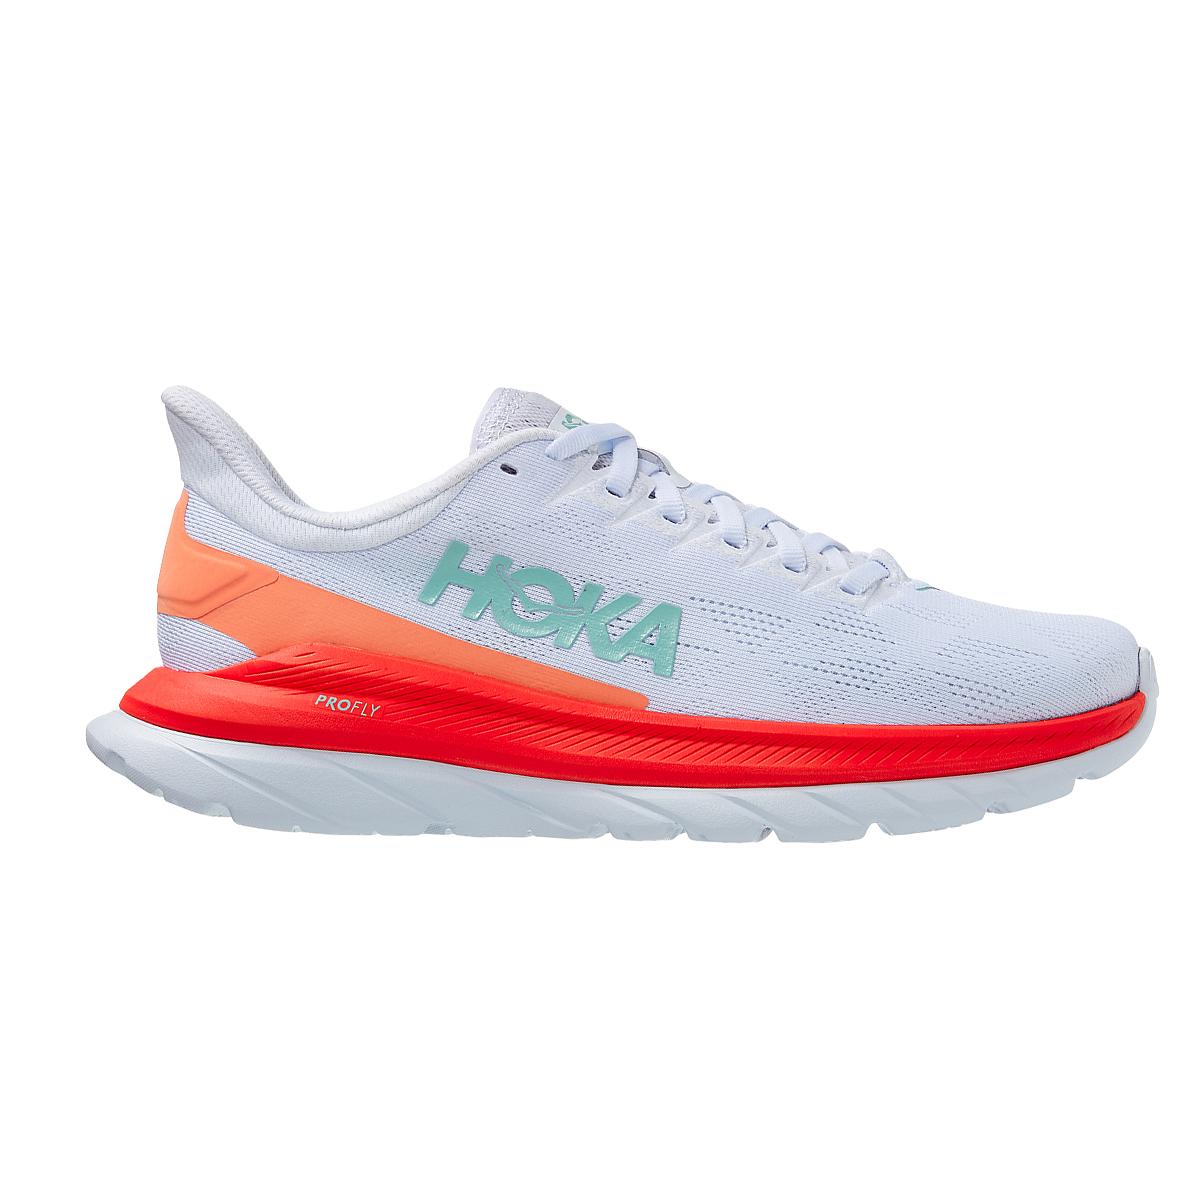 Women's Hoka One One Mach 4 Running Shoe - Color: White/Fiesta - Size: 5 - Width: Regular, White/Fiesta, large, image 2